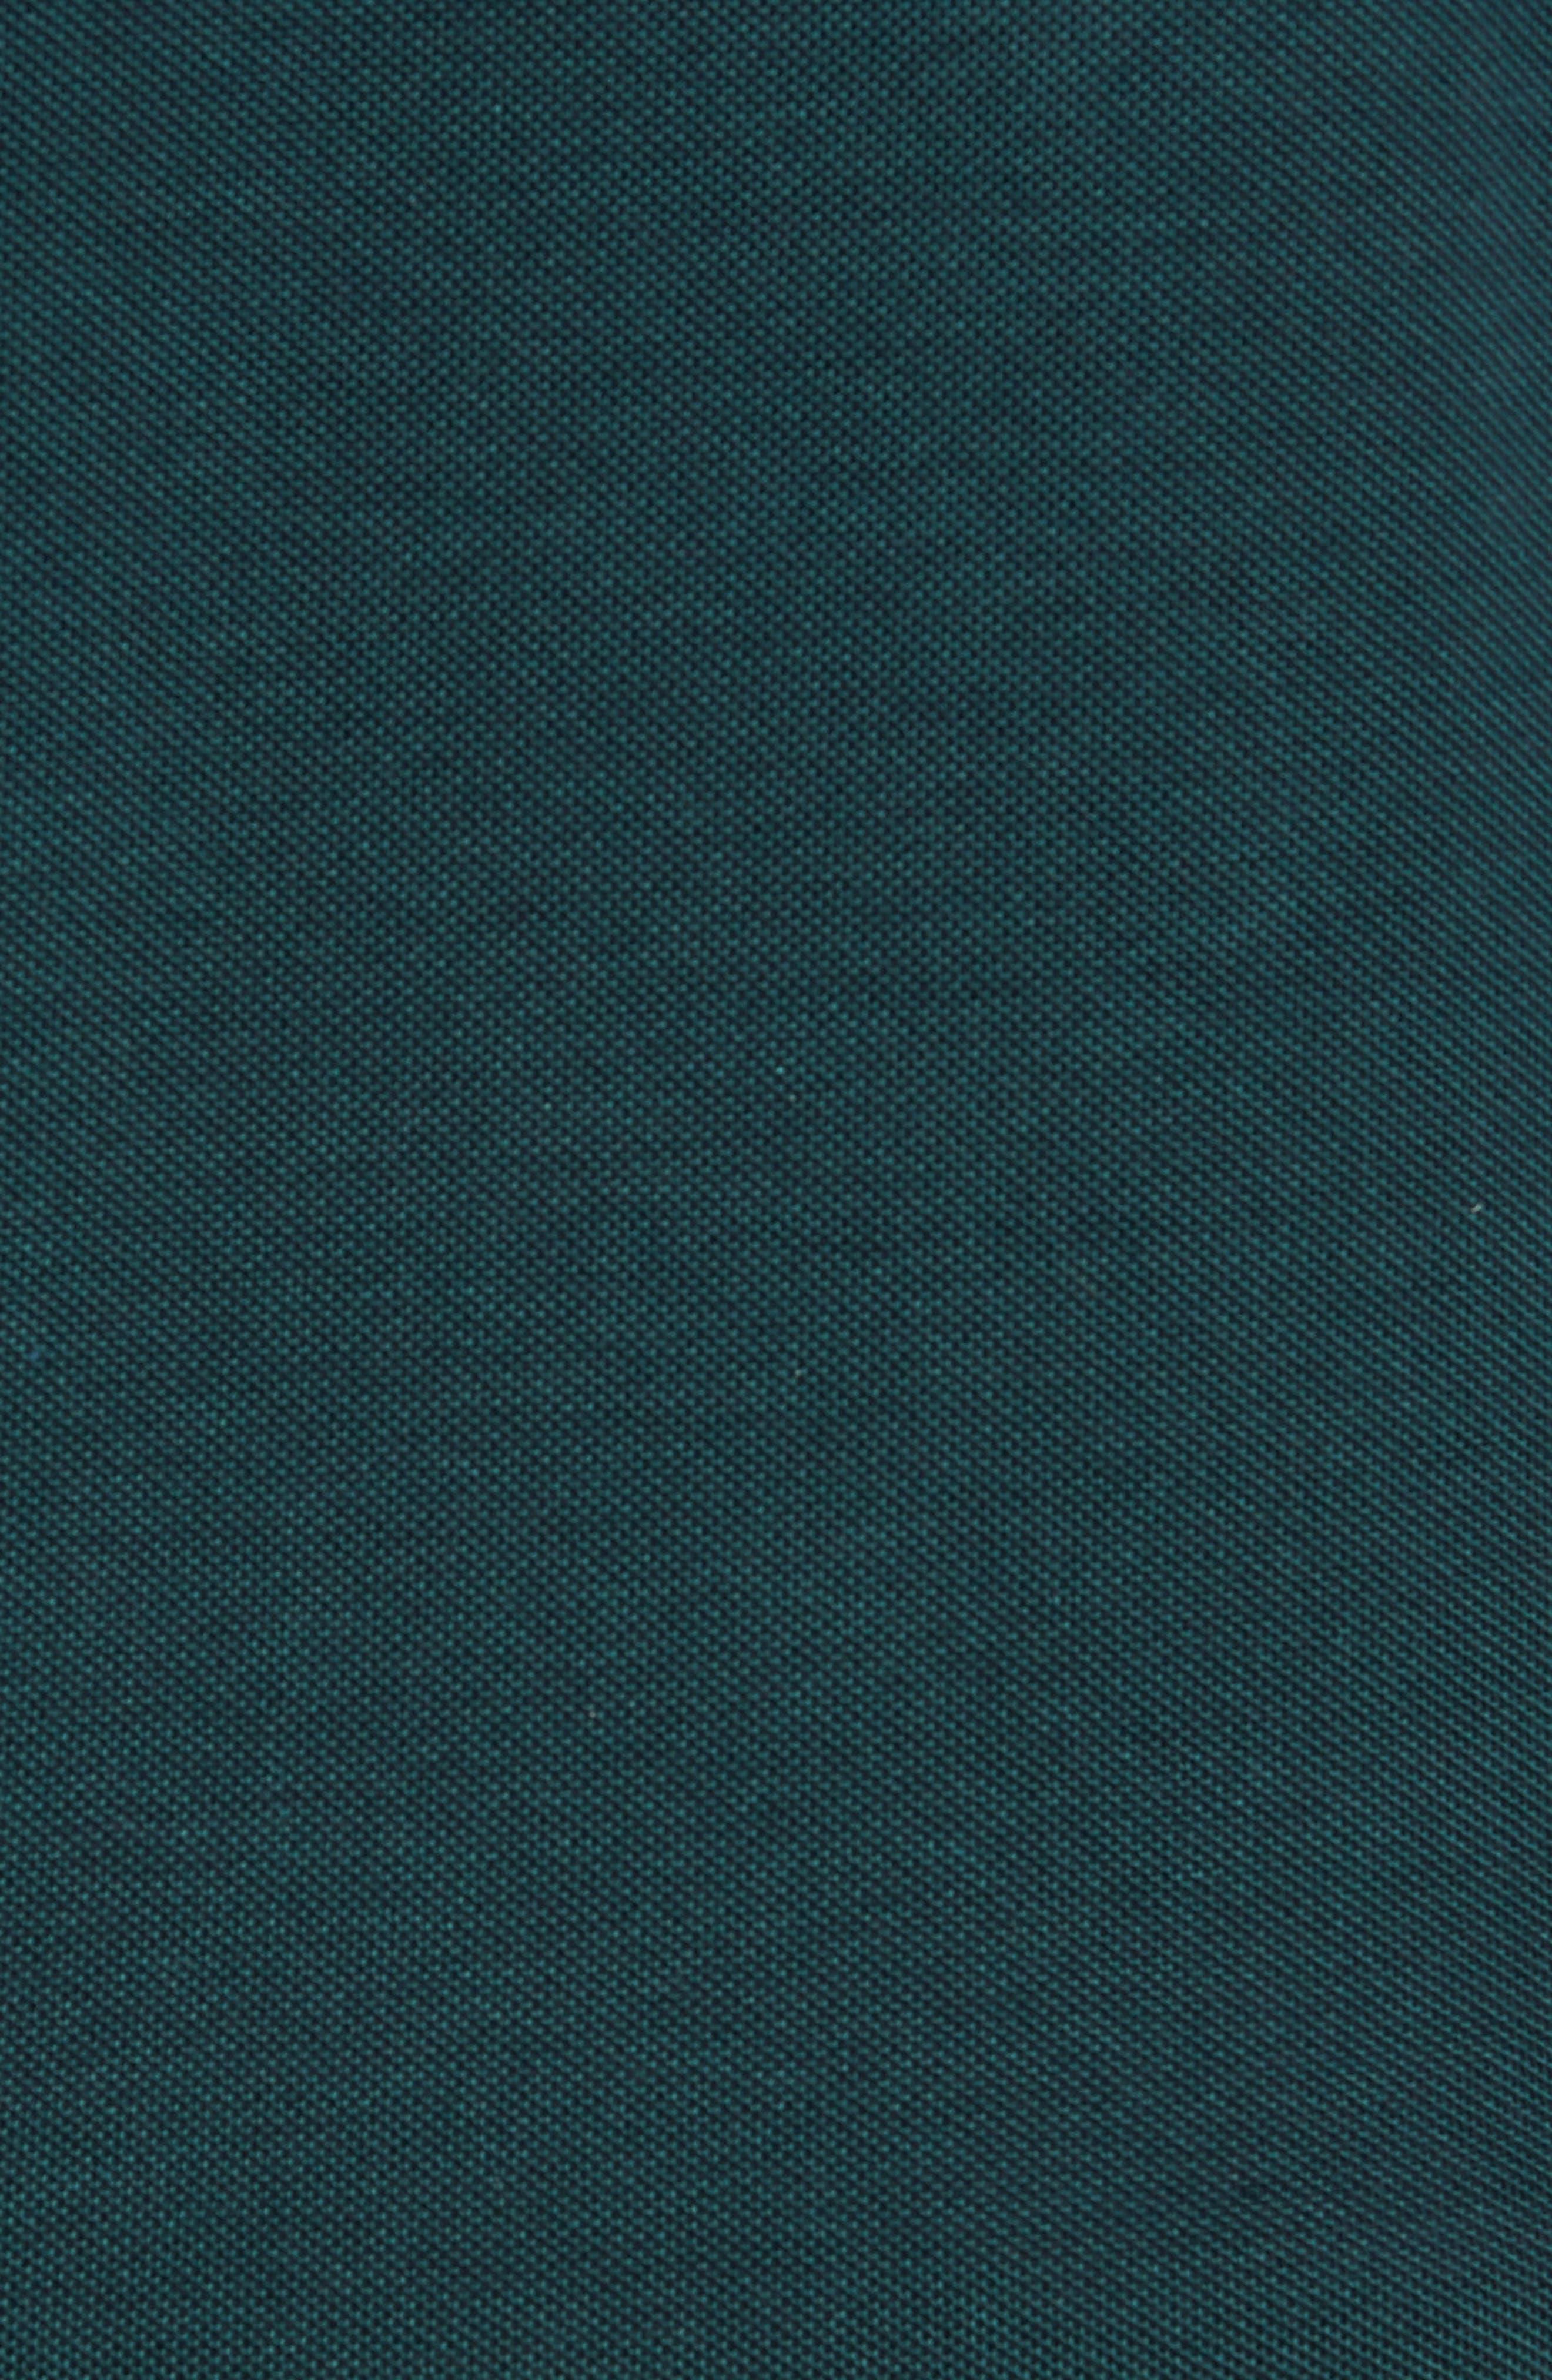 Slim Fit Long Sleeve Piqué Polo,                             Alternate thumbnail 5, color,                             ACONITE/ DARK NAVY BLUE